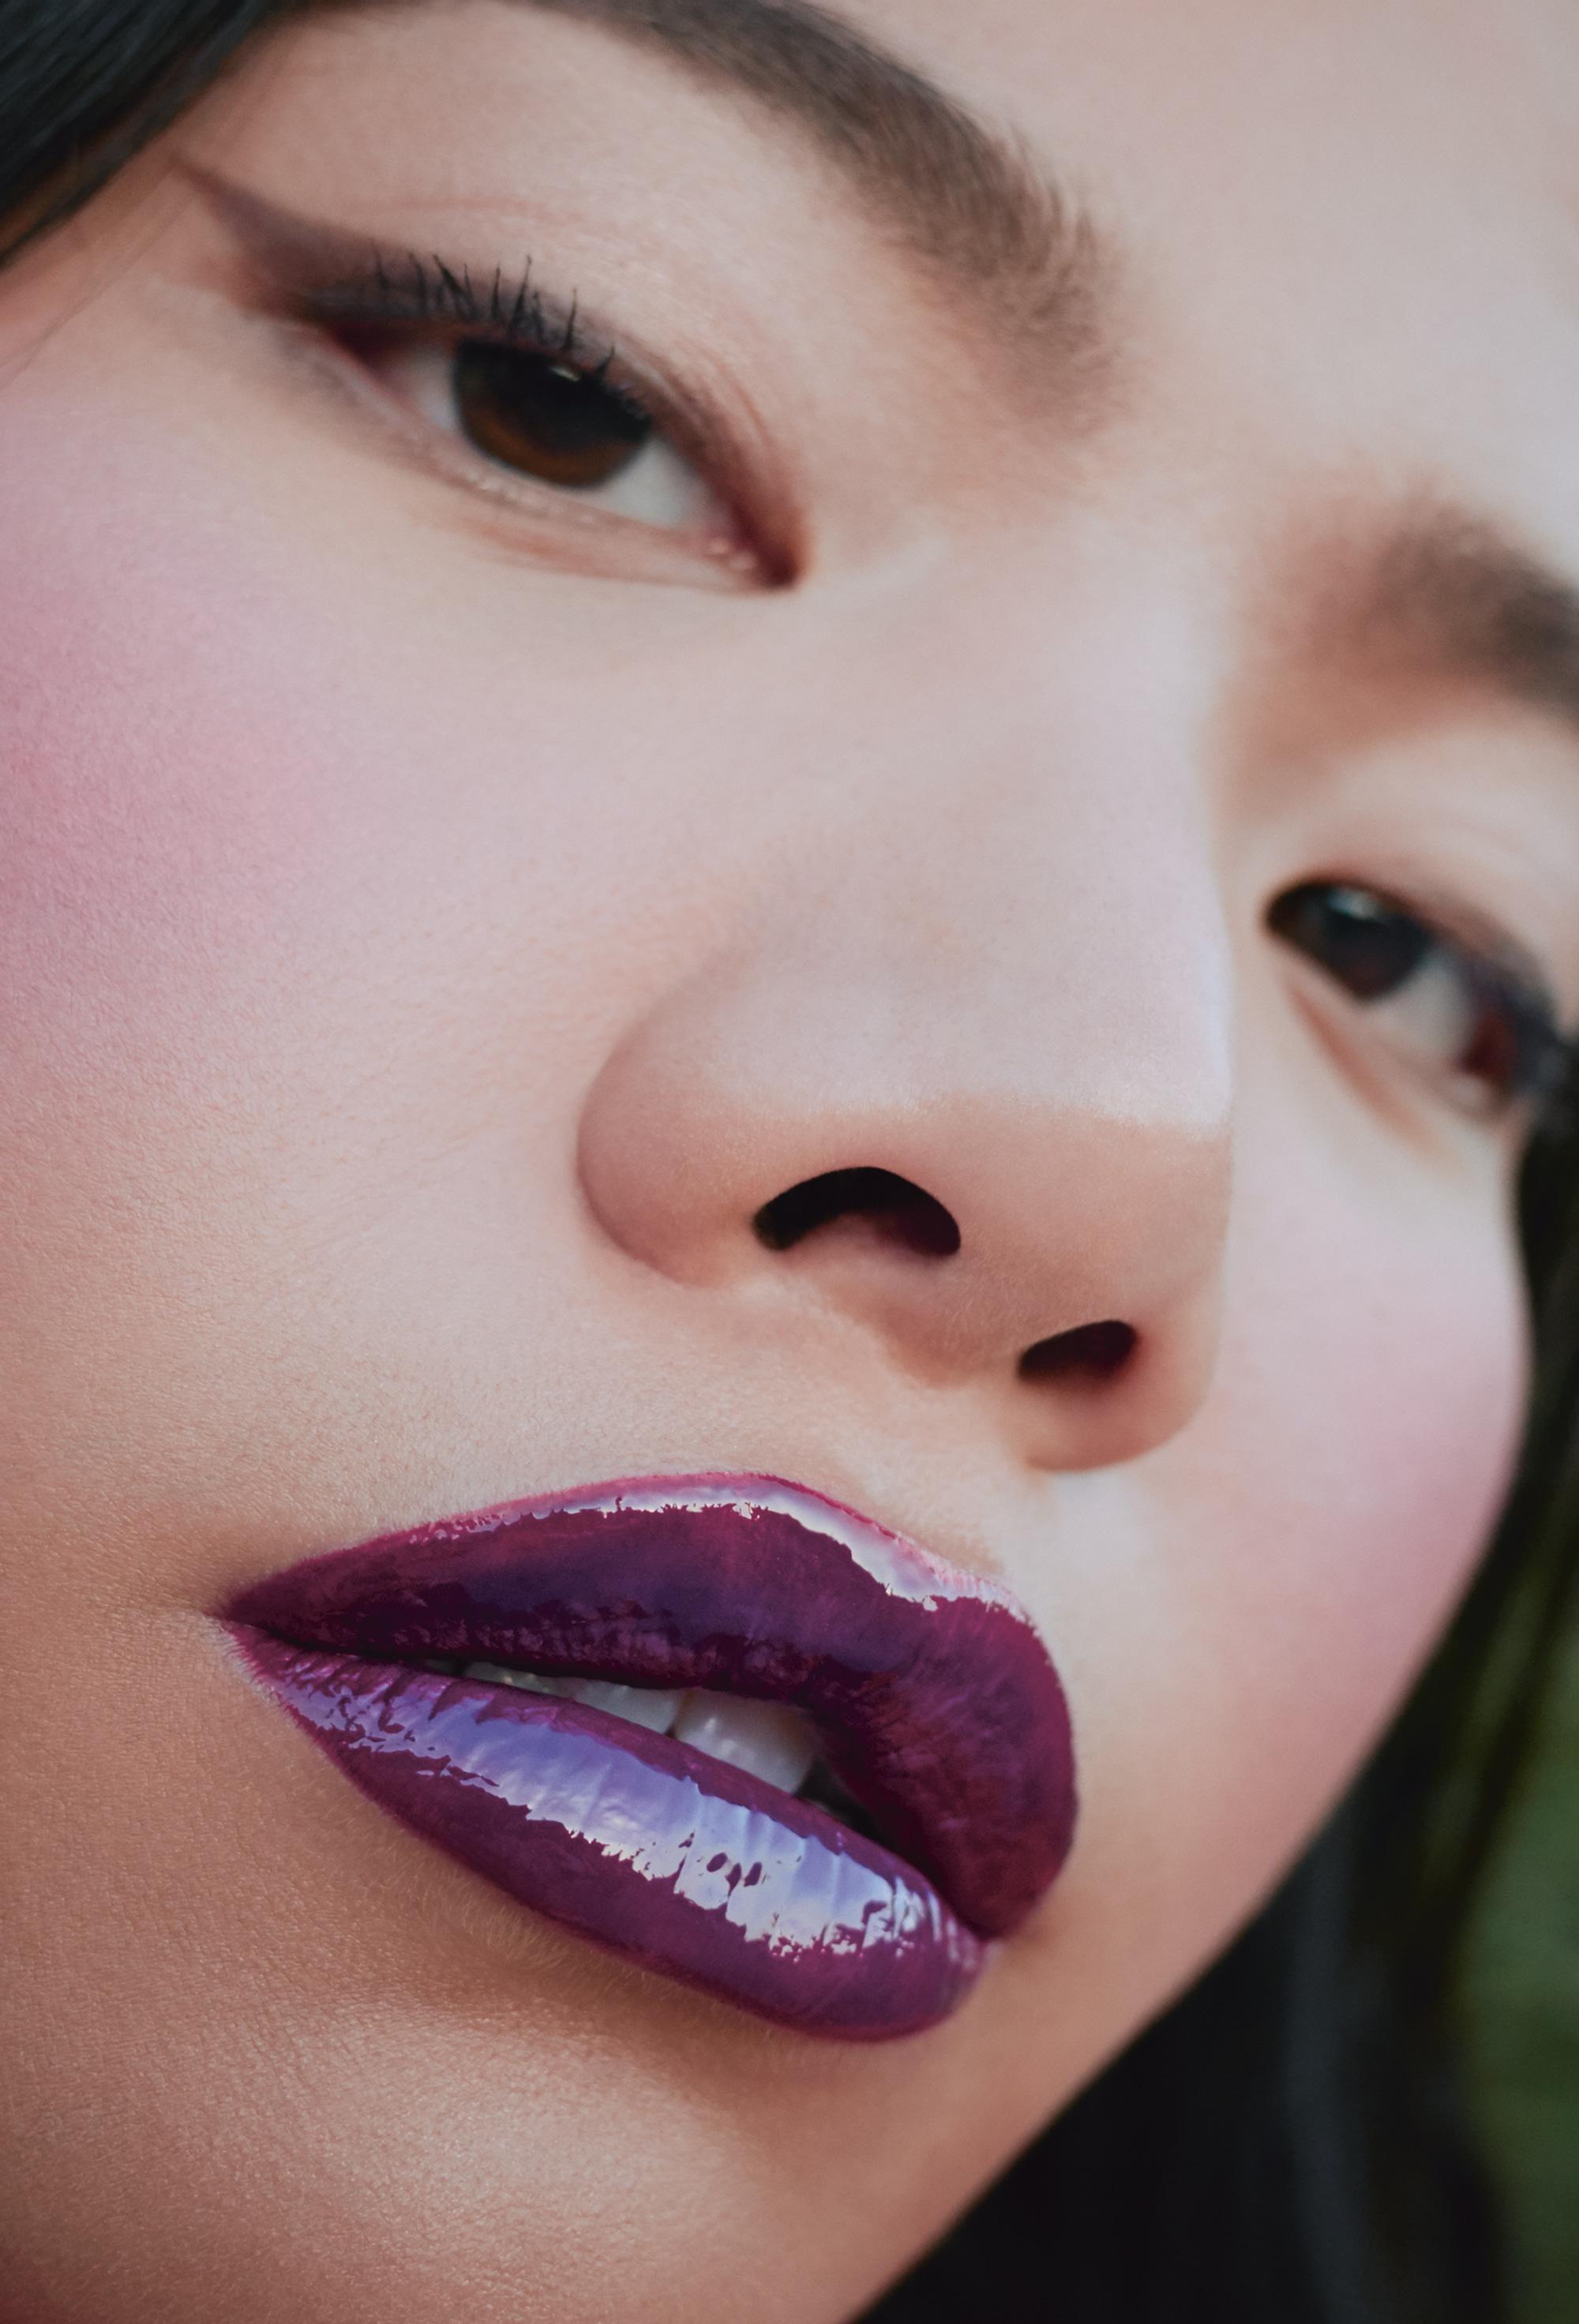 Сияющая помада Ultimate Colour, 530 Purple Steam, топпер для губ Prisma Lip Glaze, 070 You're so holo